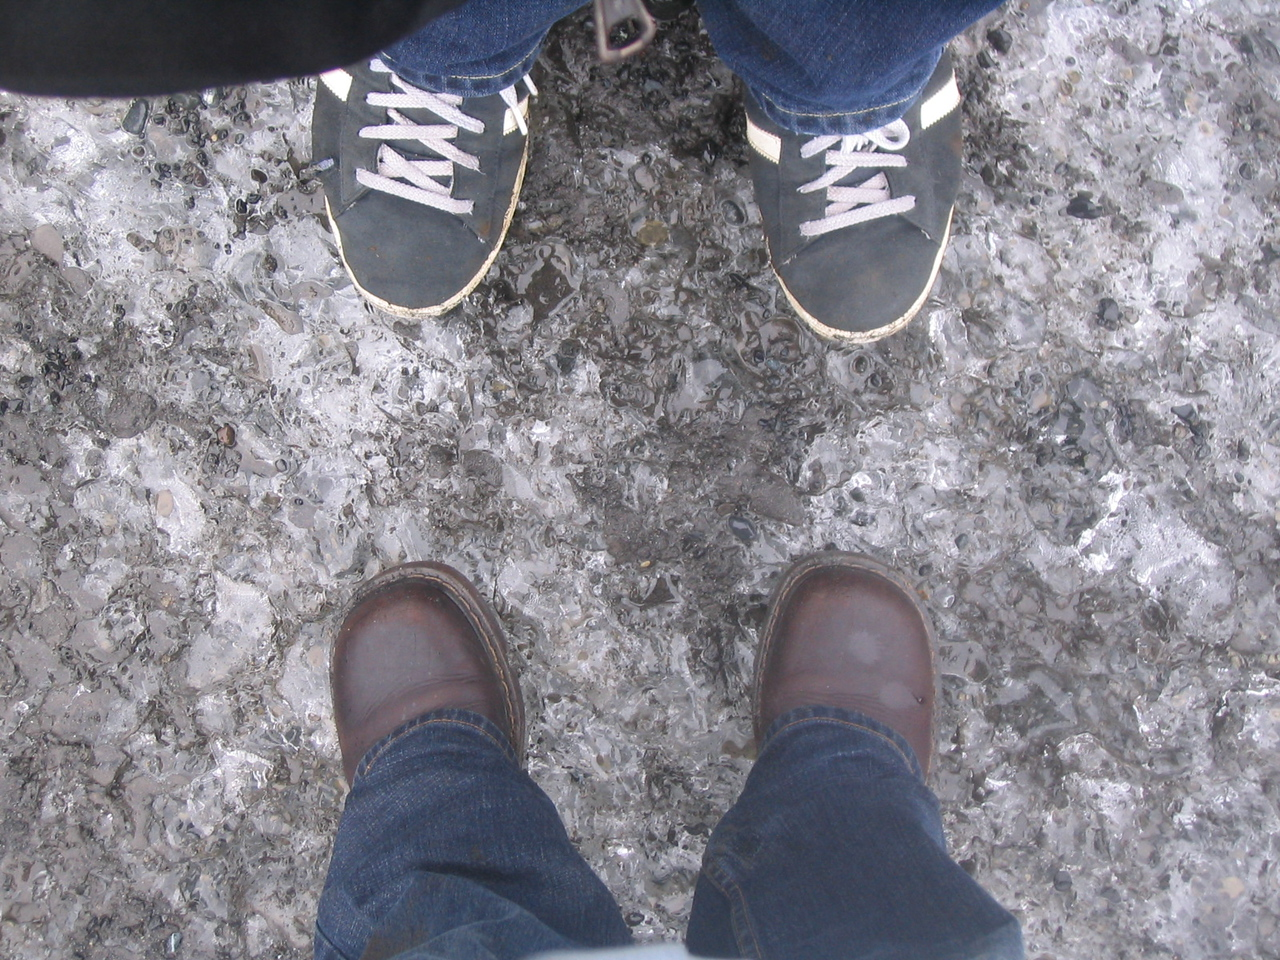 We're on the glacier